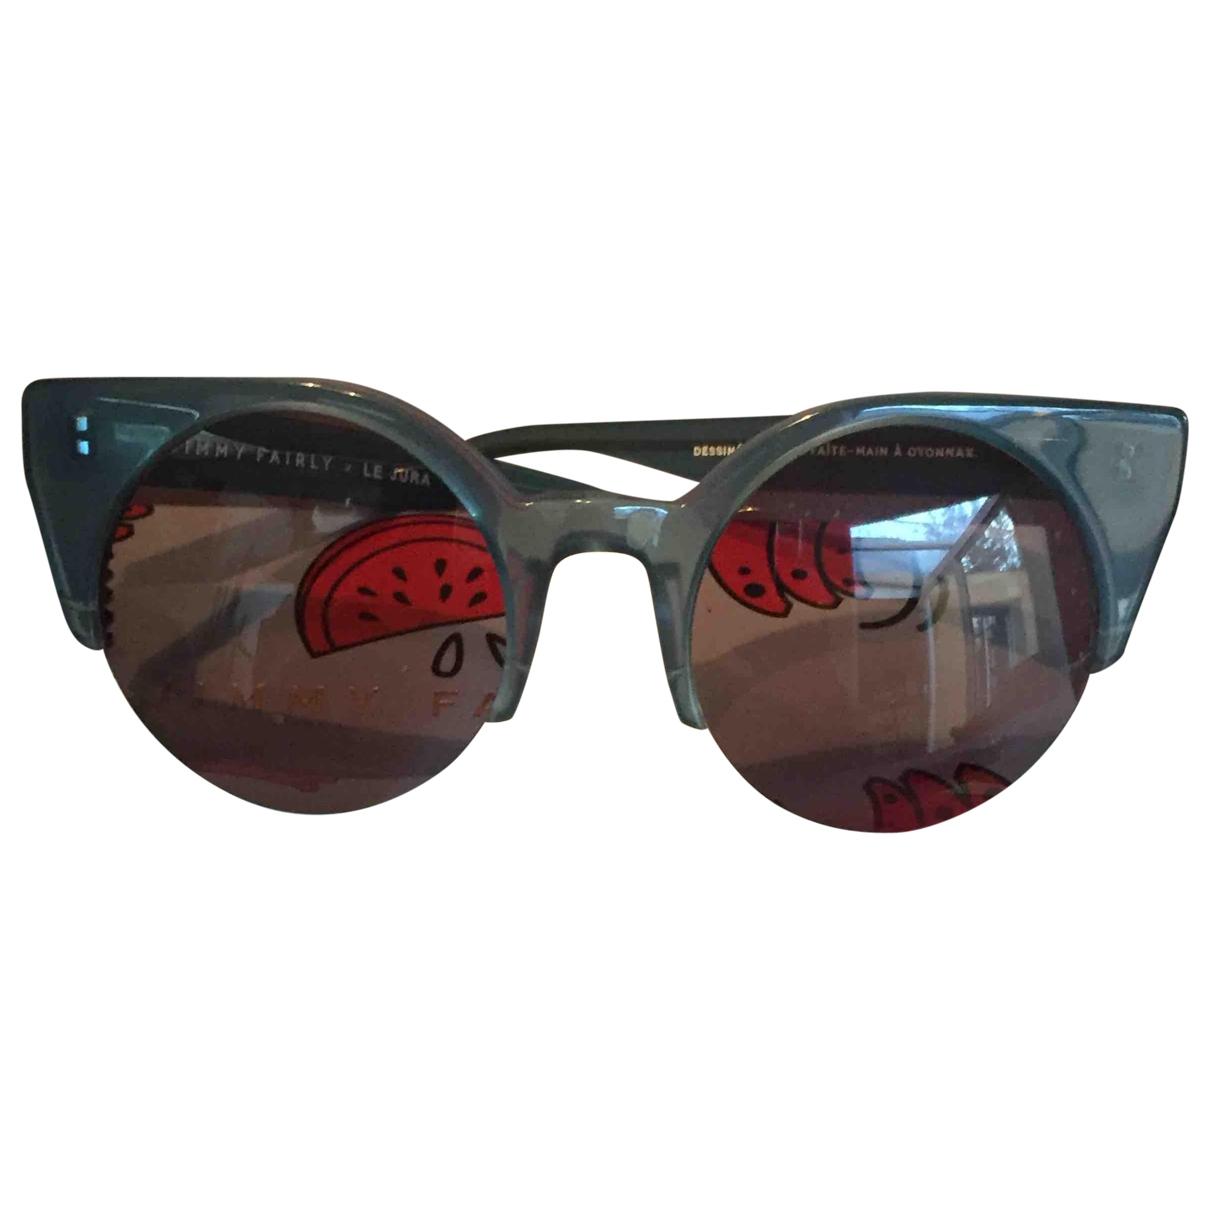 Gafas Jimmy Fairly